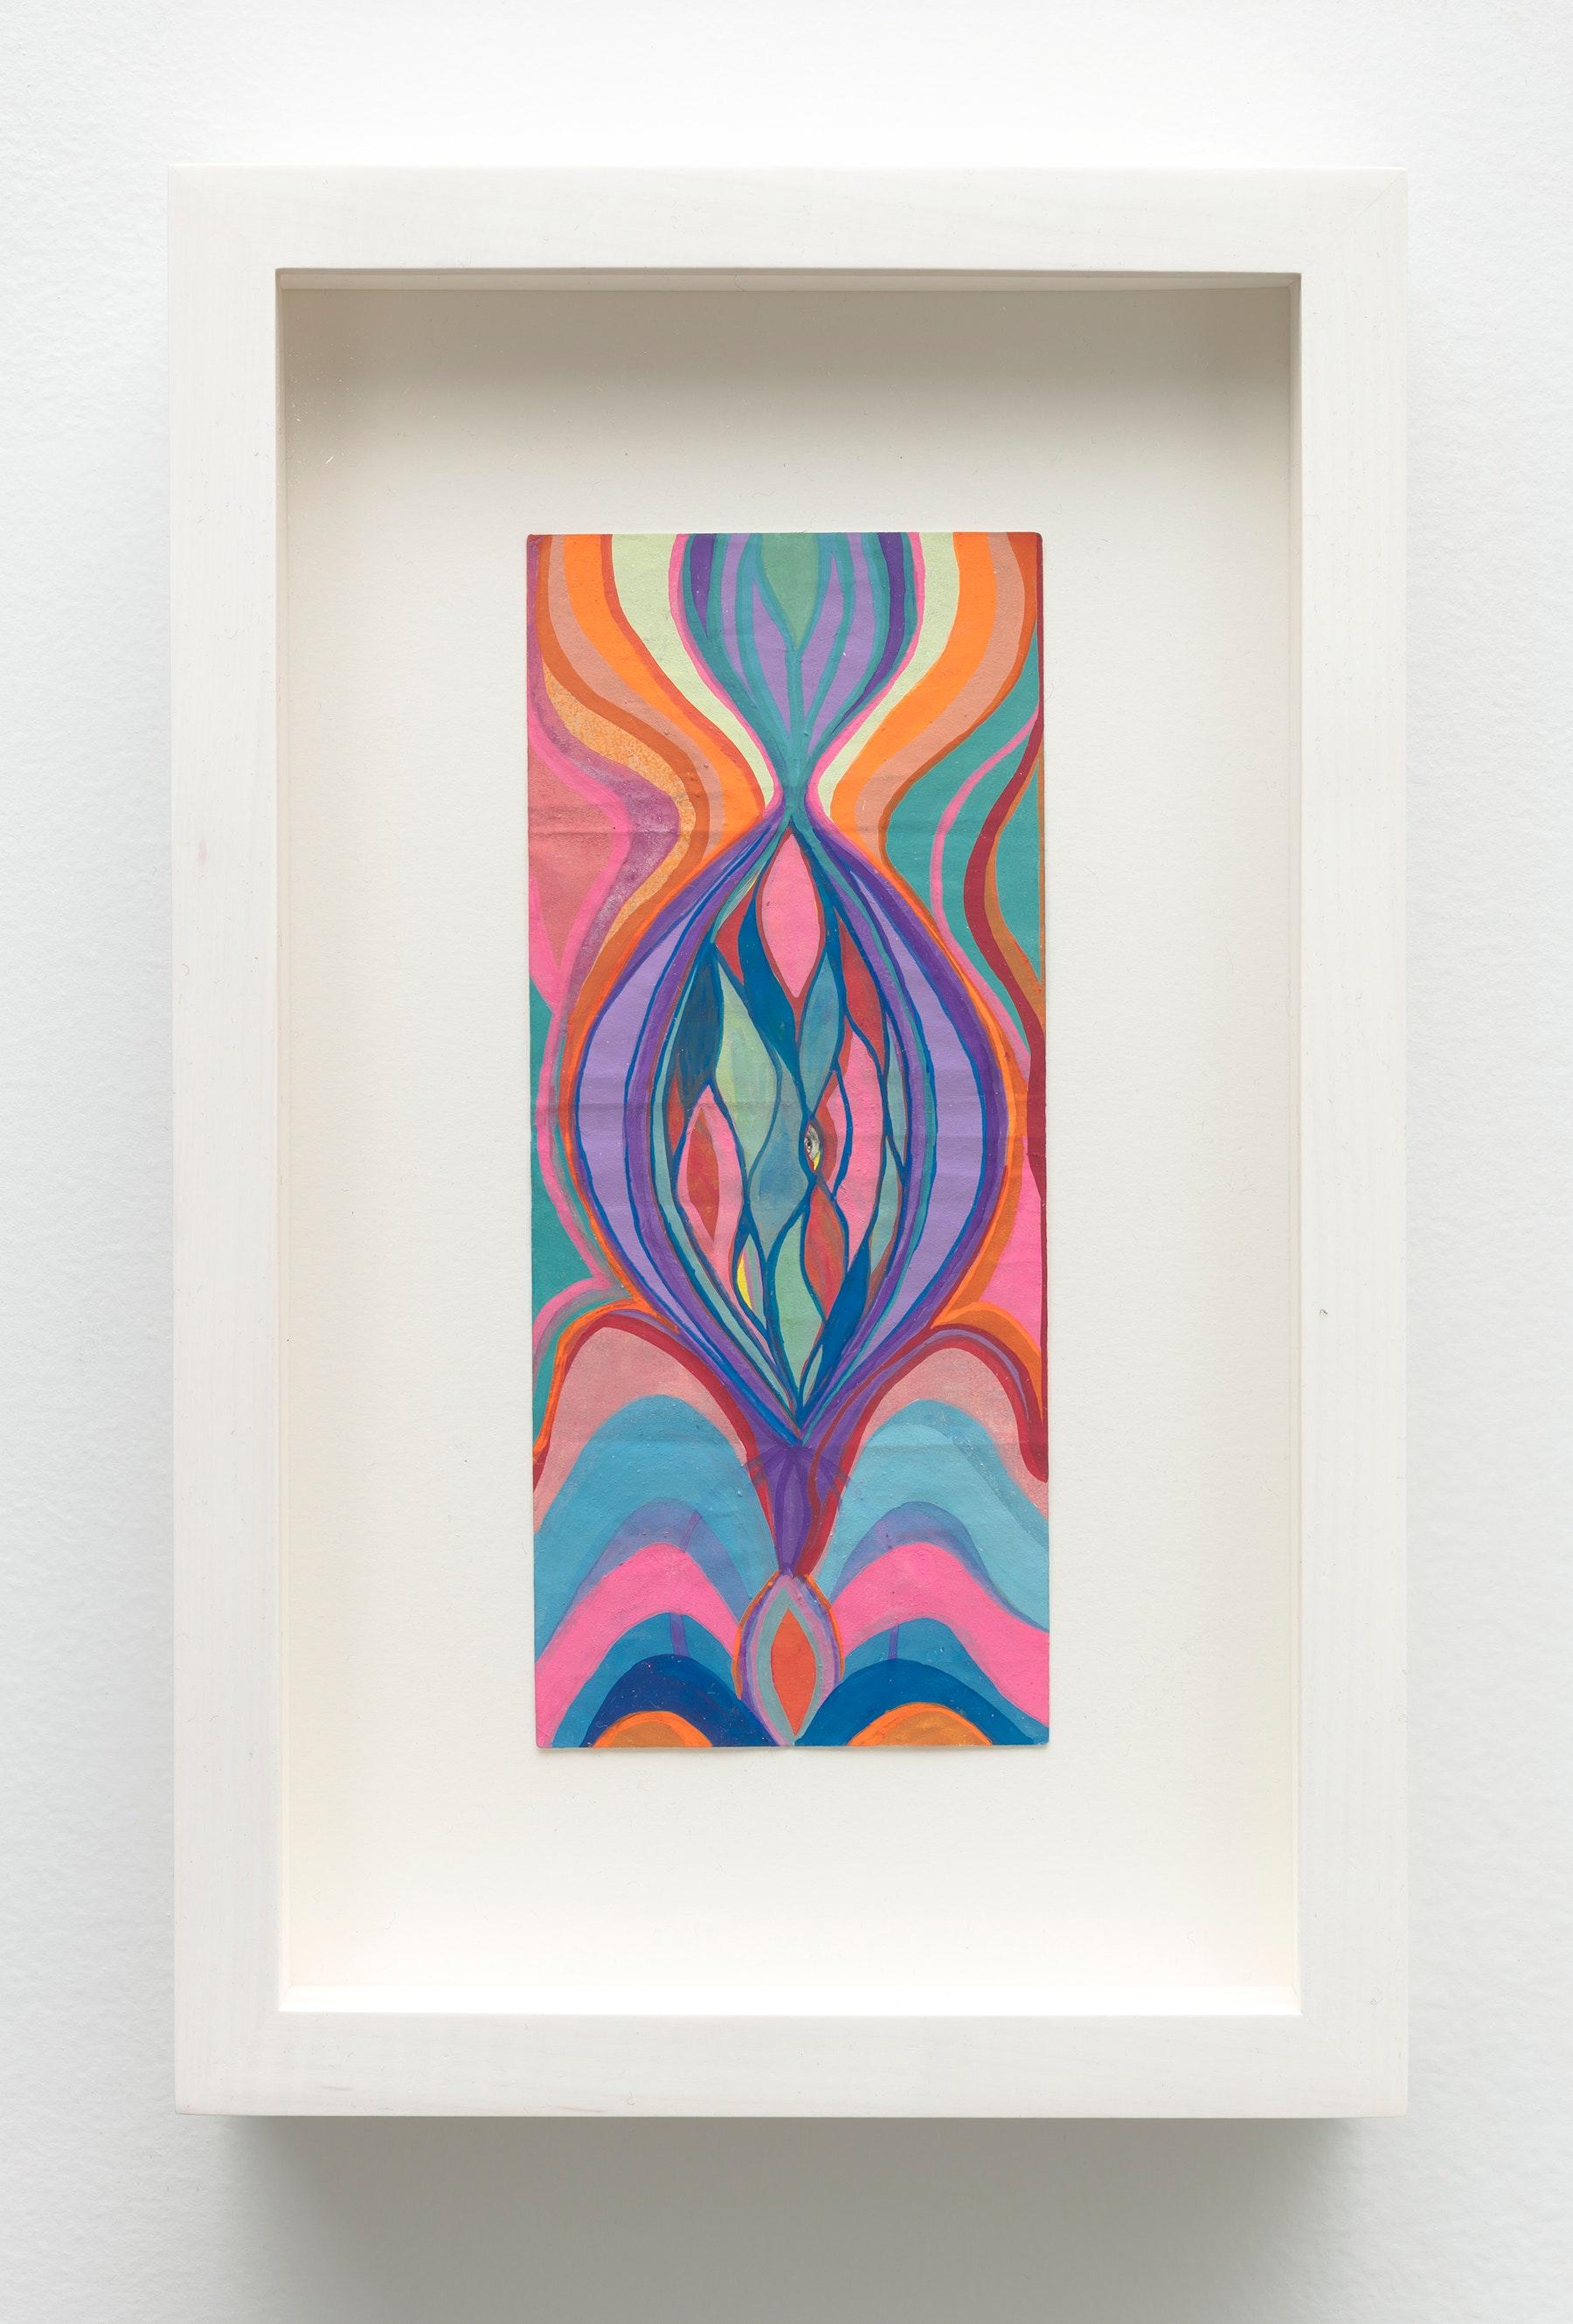 "Sarah Cain ""$ talisman,"" 2019 Acrylic on dollar bill 9.5 x 6.25 x 1.75"" [HxWxD] (24.13 x 15.88 x 4.45 cm) Inventory #CAS140 Courtesy of the artist and Vielmetter Los Angeles Photo credit: Robert Wedemeyer"